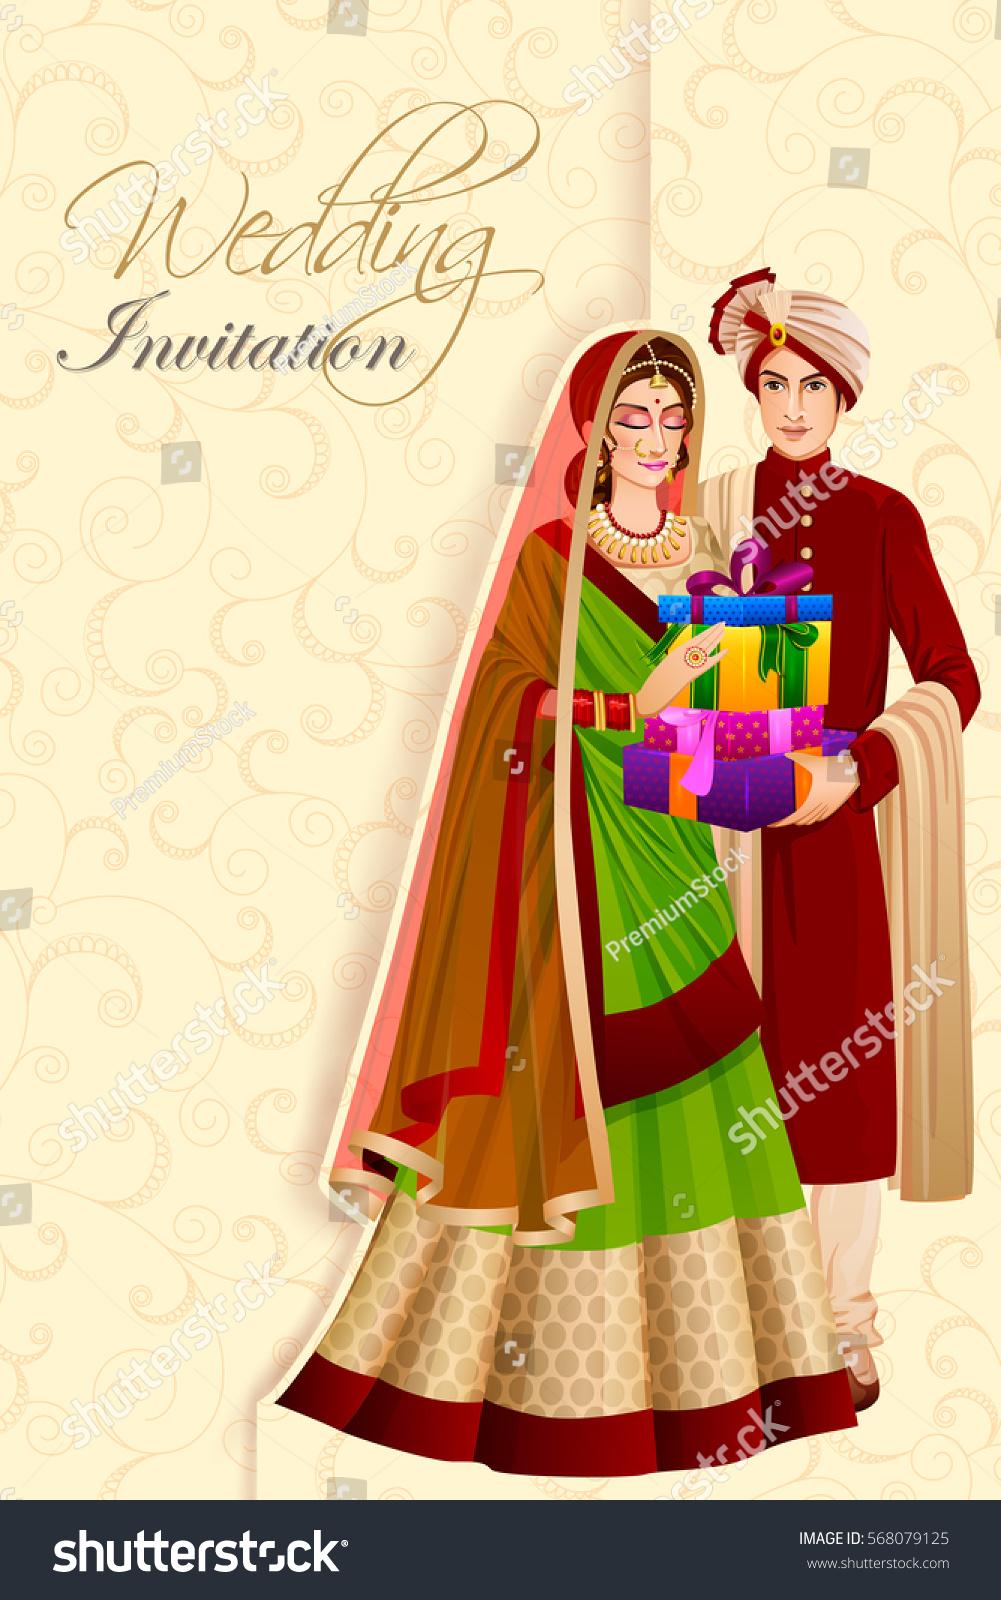 Vector Design Indian Man Couple Gift Stock Vector Royalty Free 568079125